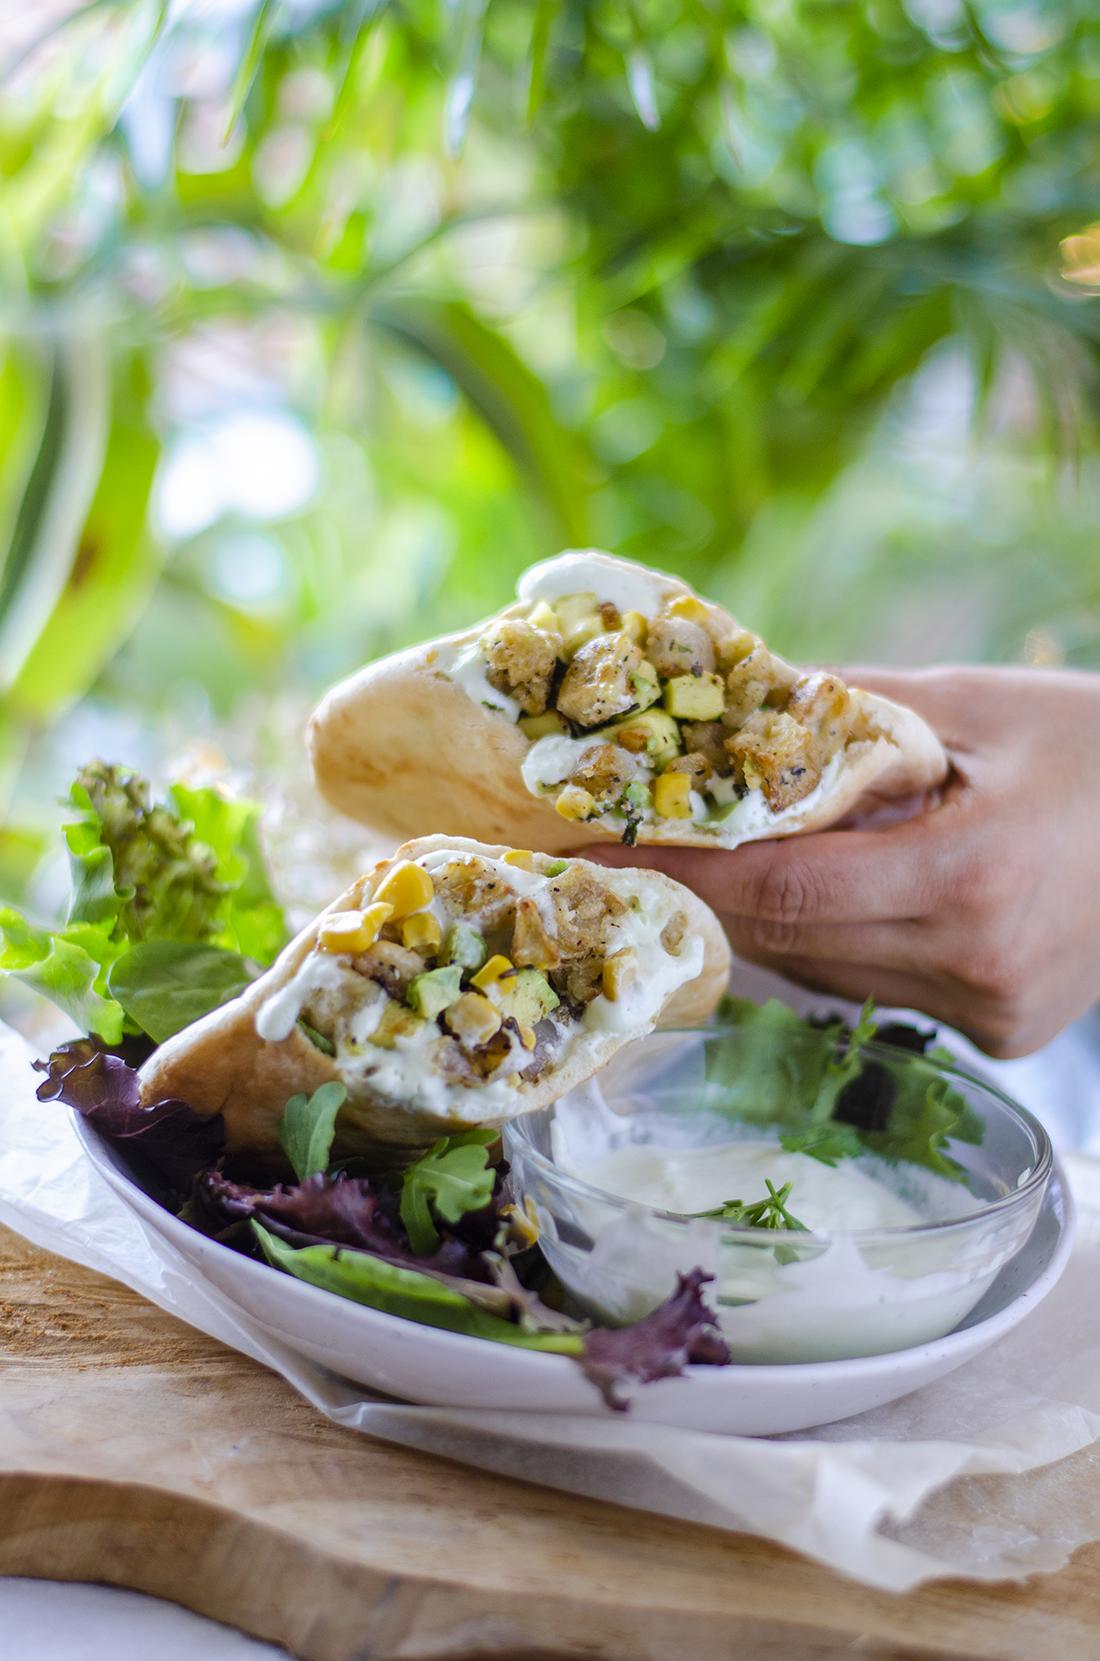 Receta vegetariana (vegana): pitas de tempura de Berenjena con mayonesa de perejil.